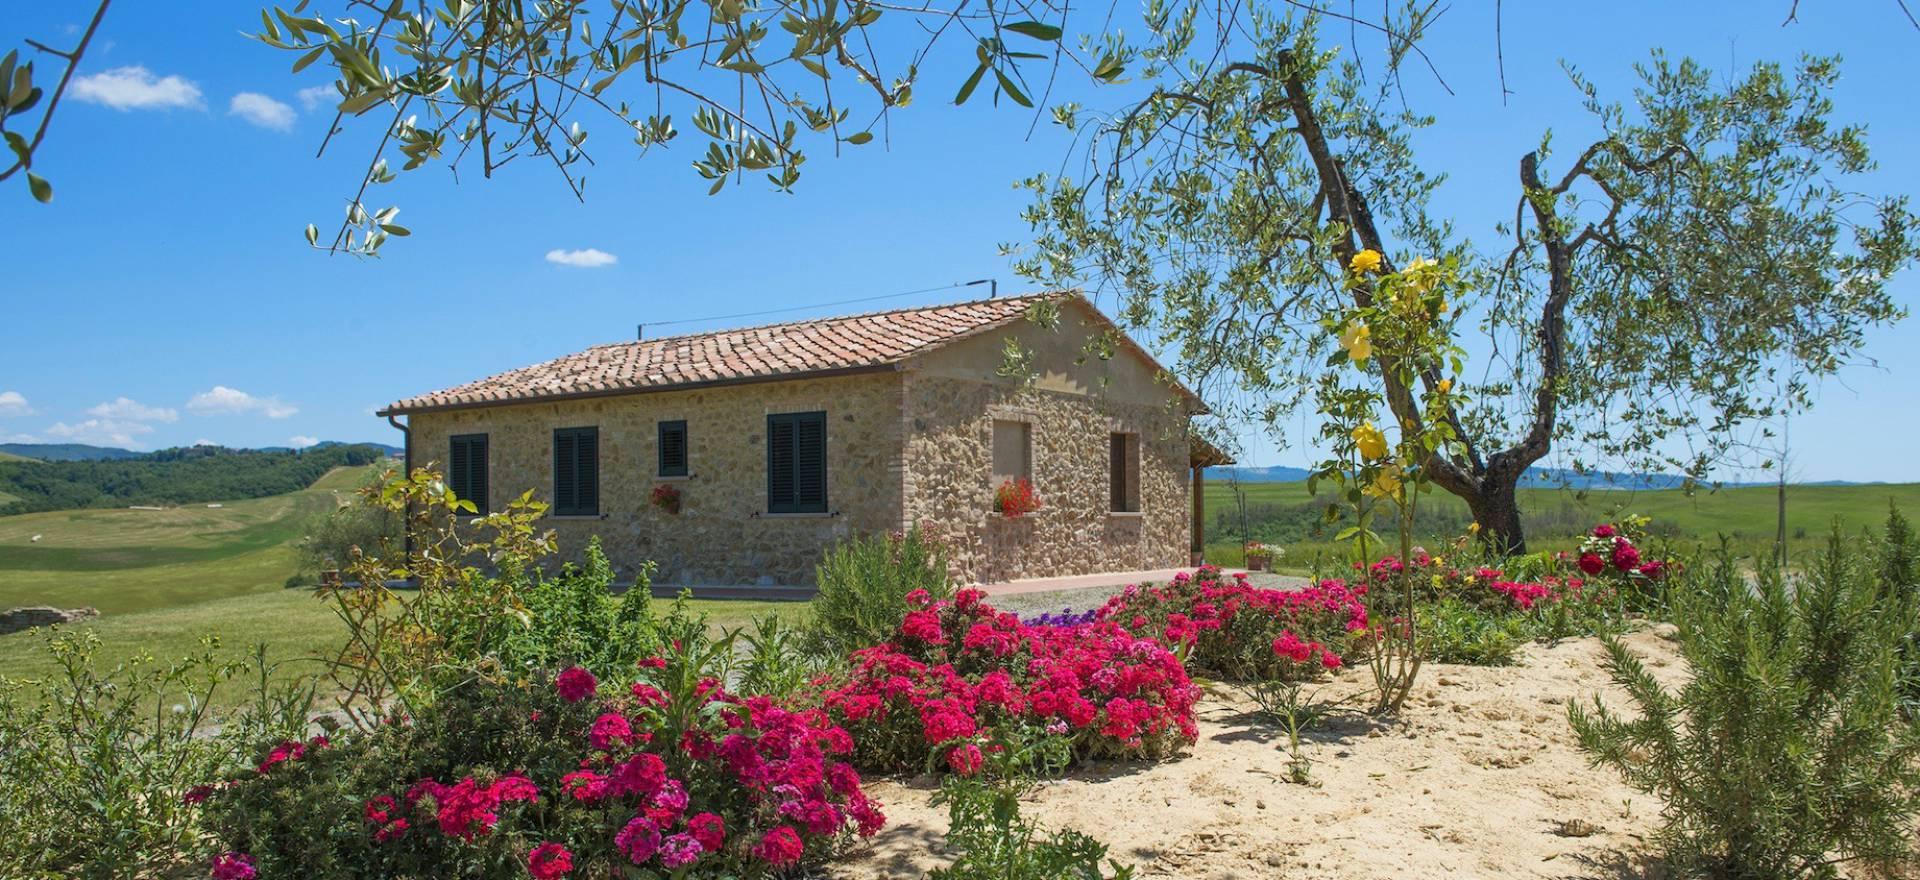 Familie-vriendelijke agriturismo Toscane met mooi zwembad